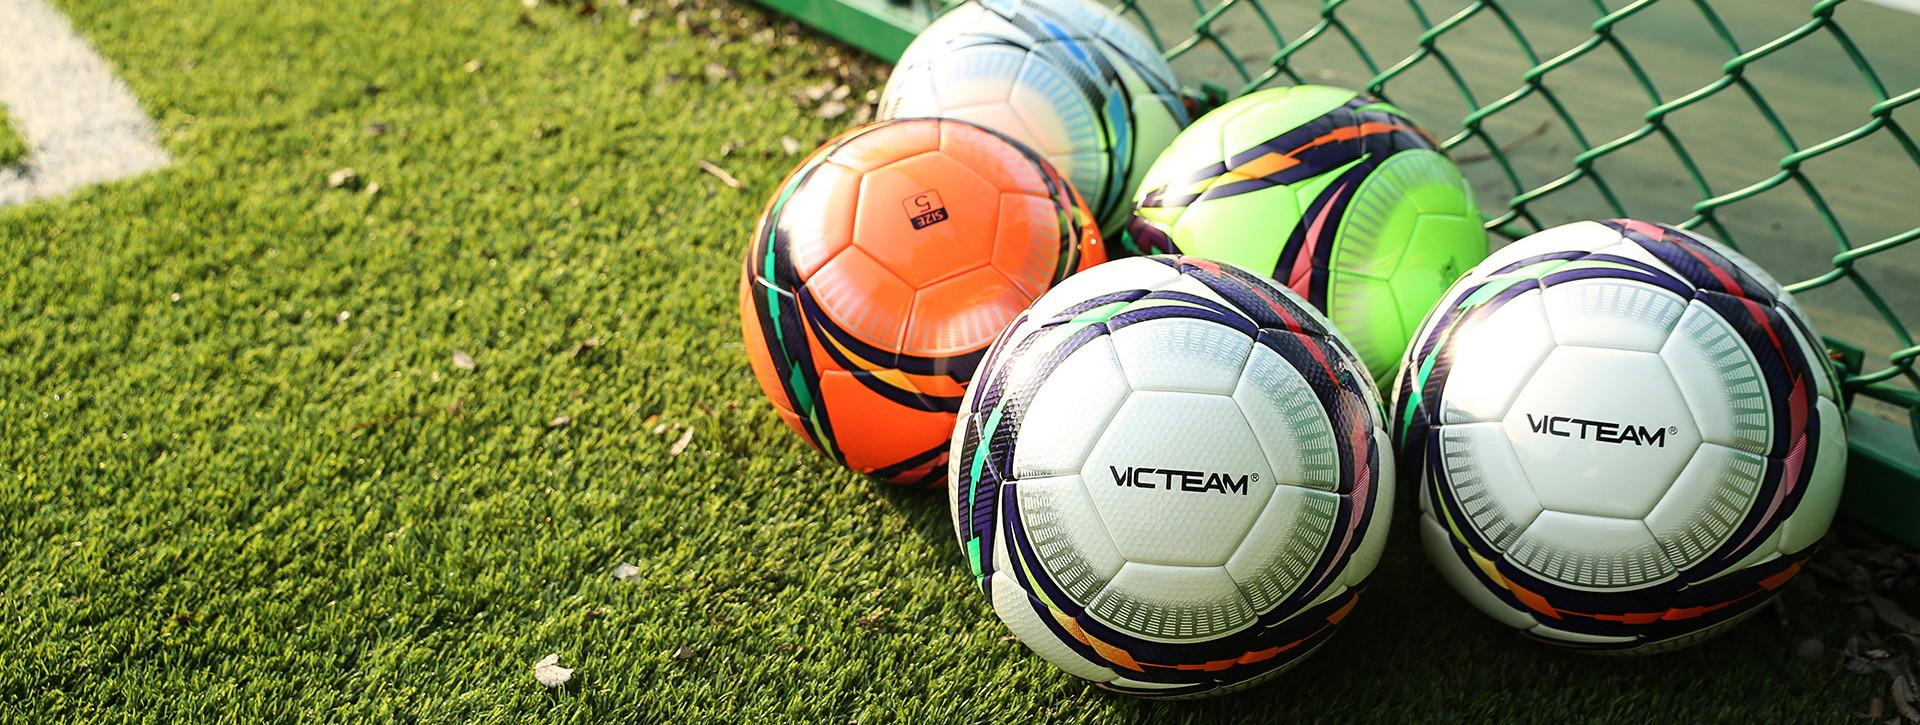 Victeam Sports Soccer Balls